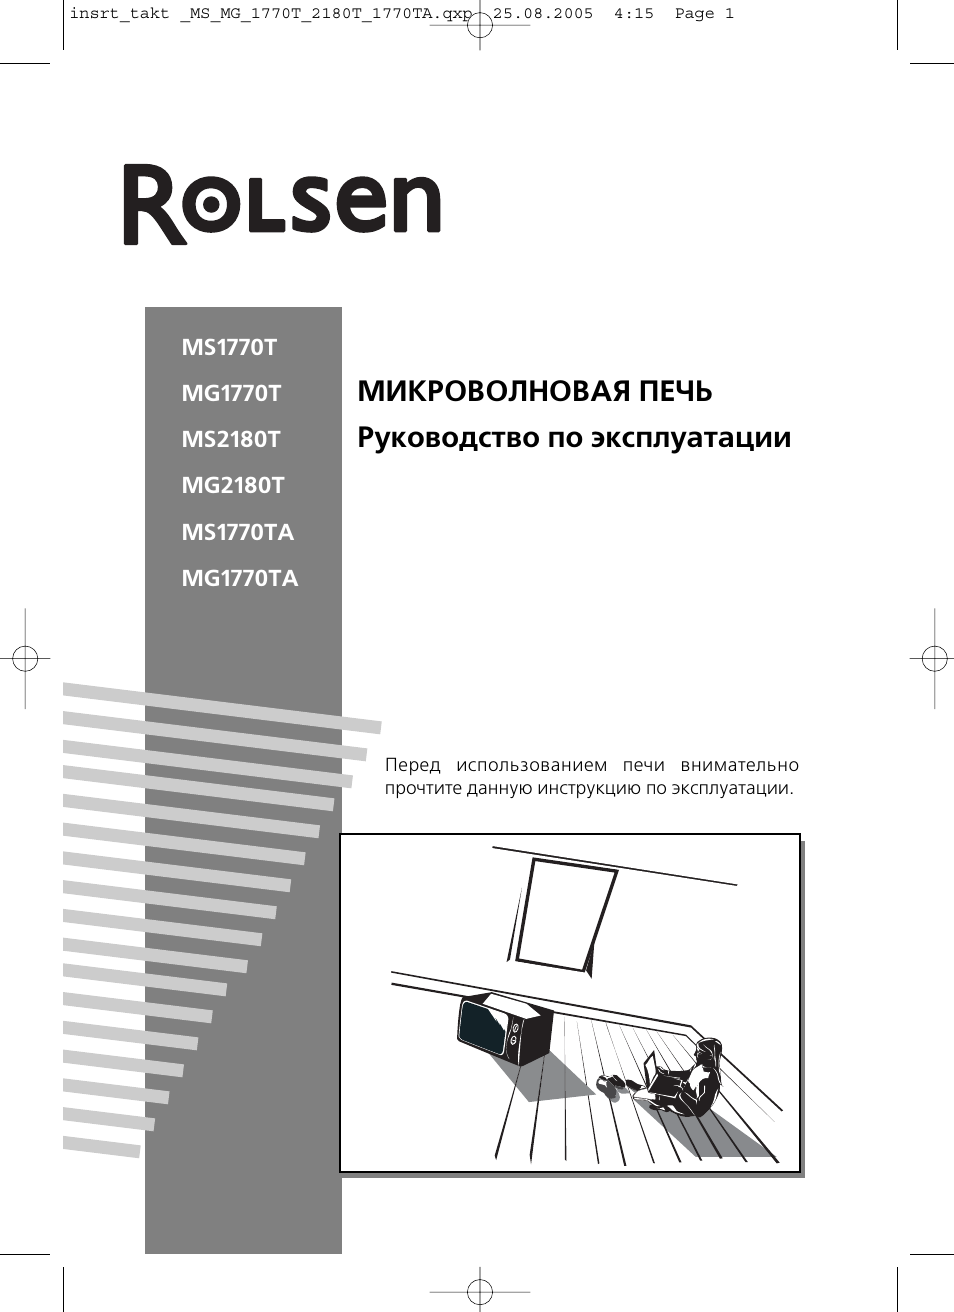 Rolsen mg2080sc инструкция